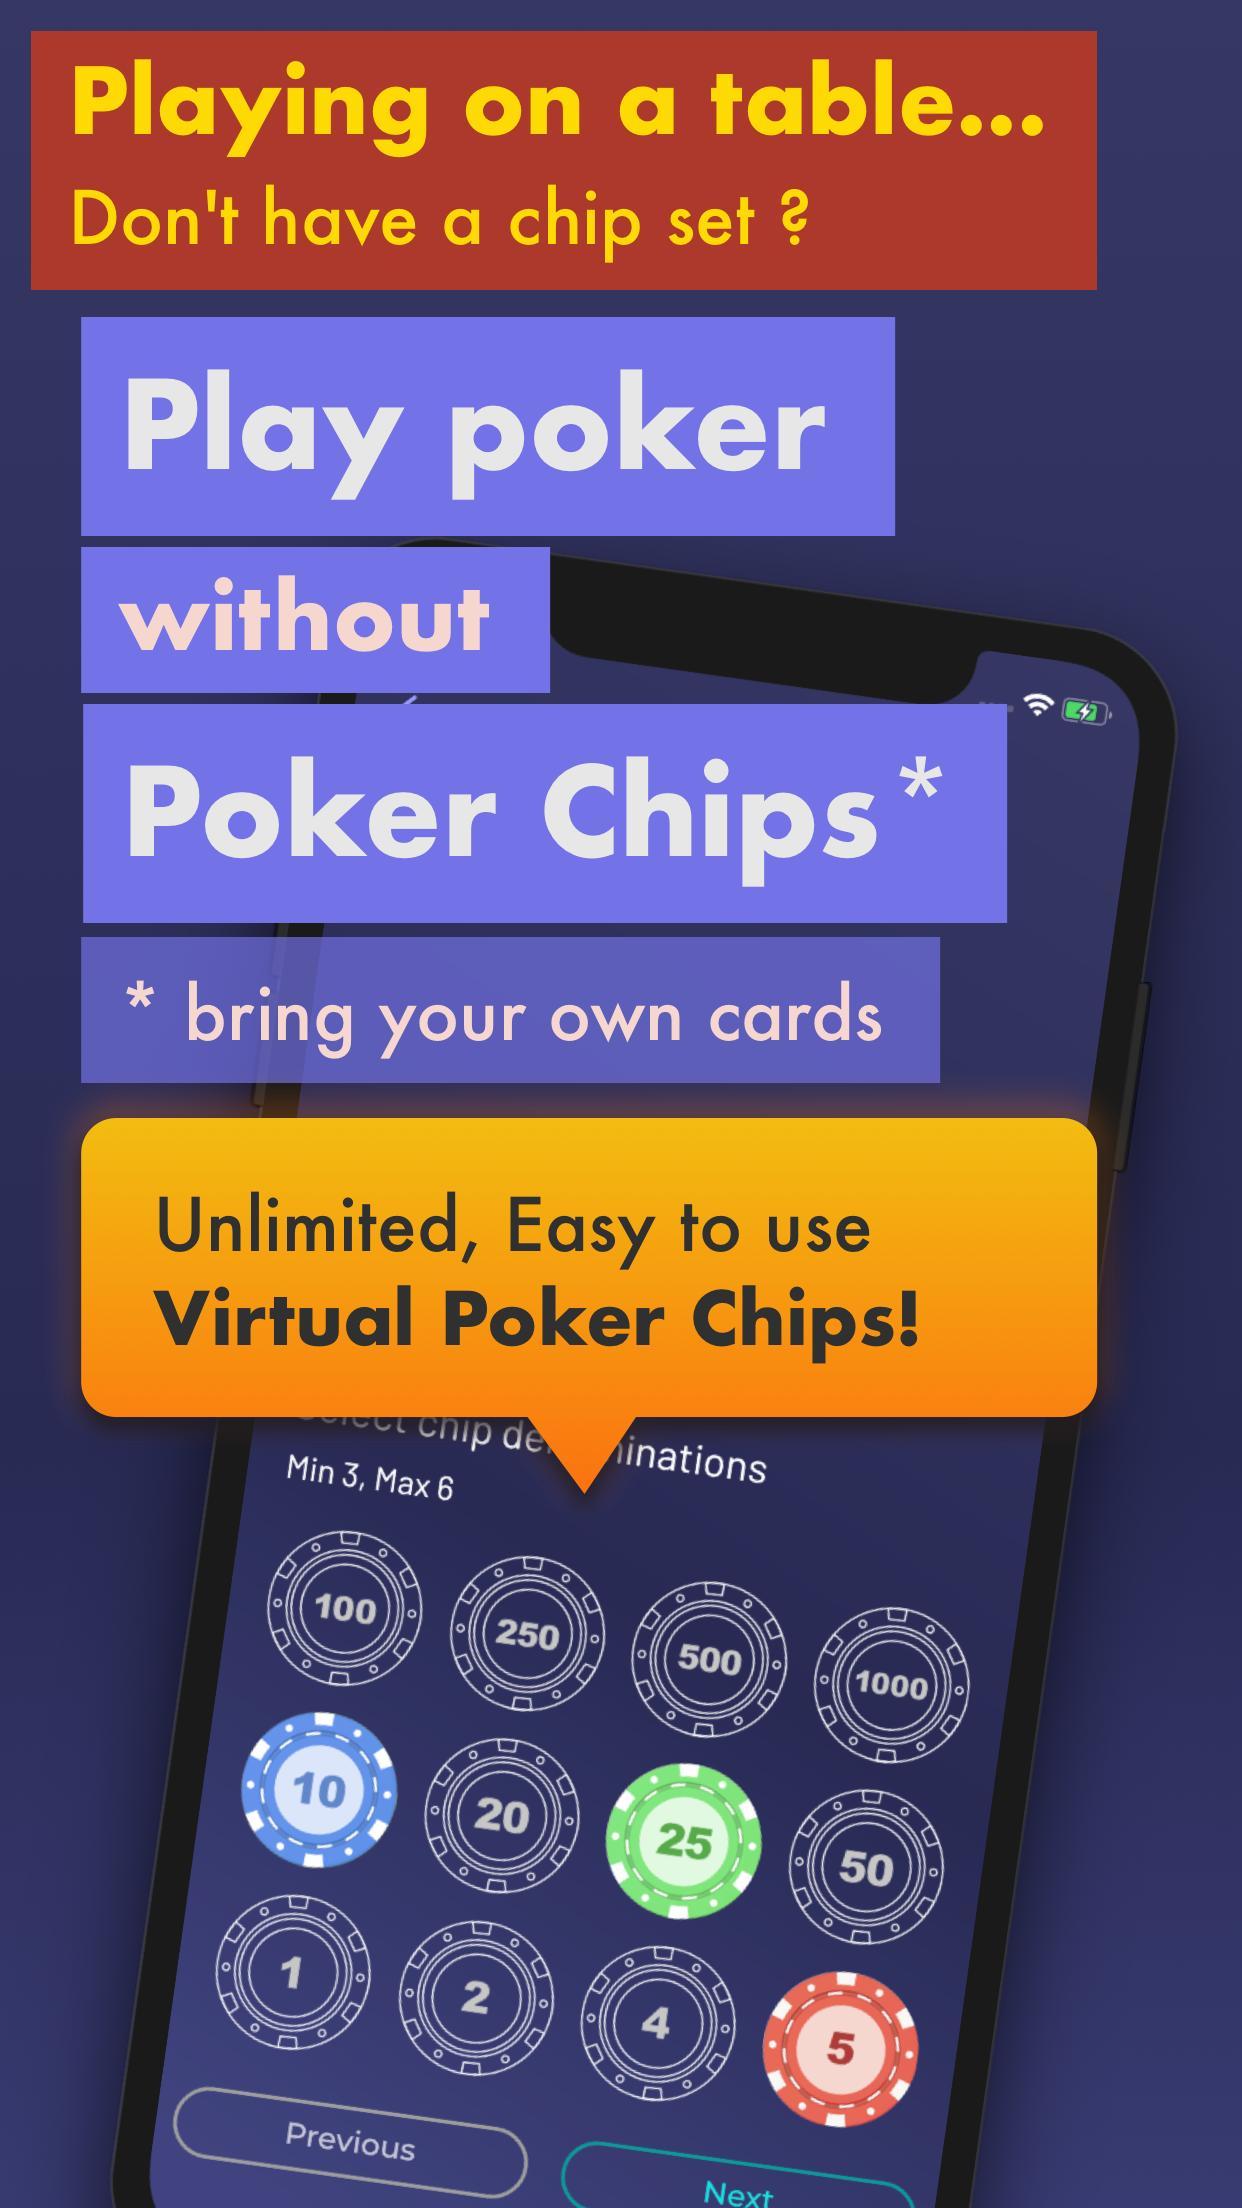 Chips of Fury Virtual Poker Chips, Poker Table 2.0.6 Screenshot 2